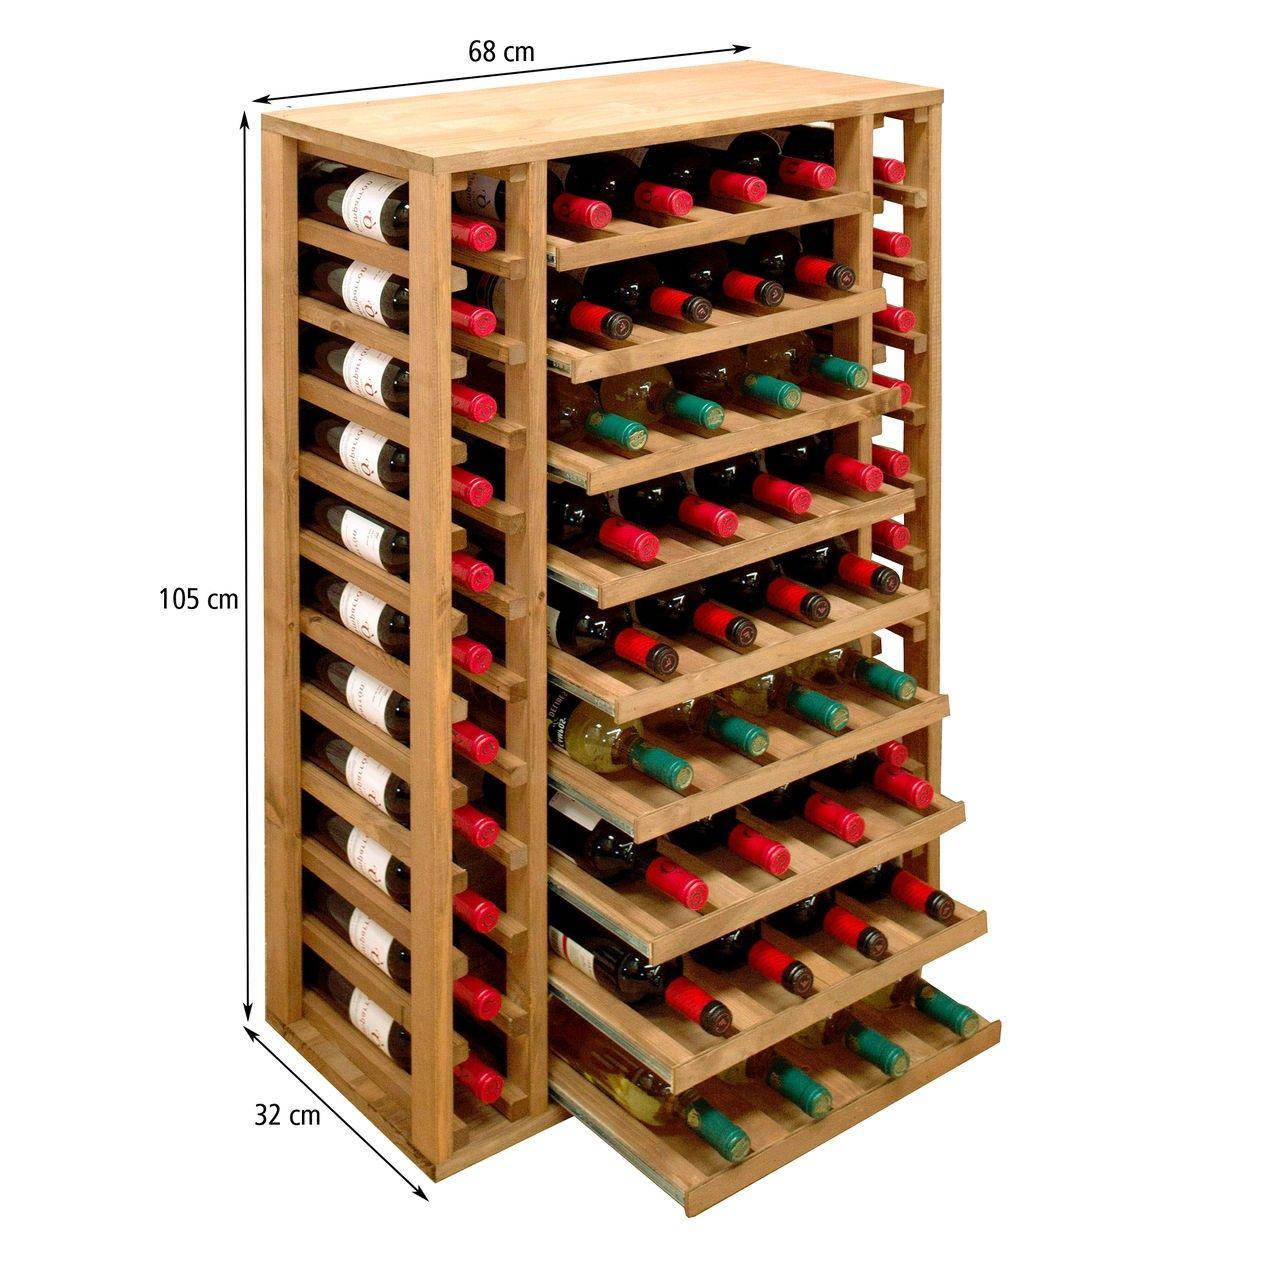 weinregal provinalia eiche modulares weinregalsystem. Black Bedroom Furniture Sets. Home Design Ideas